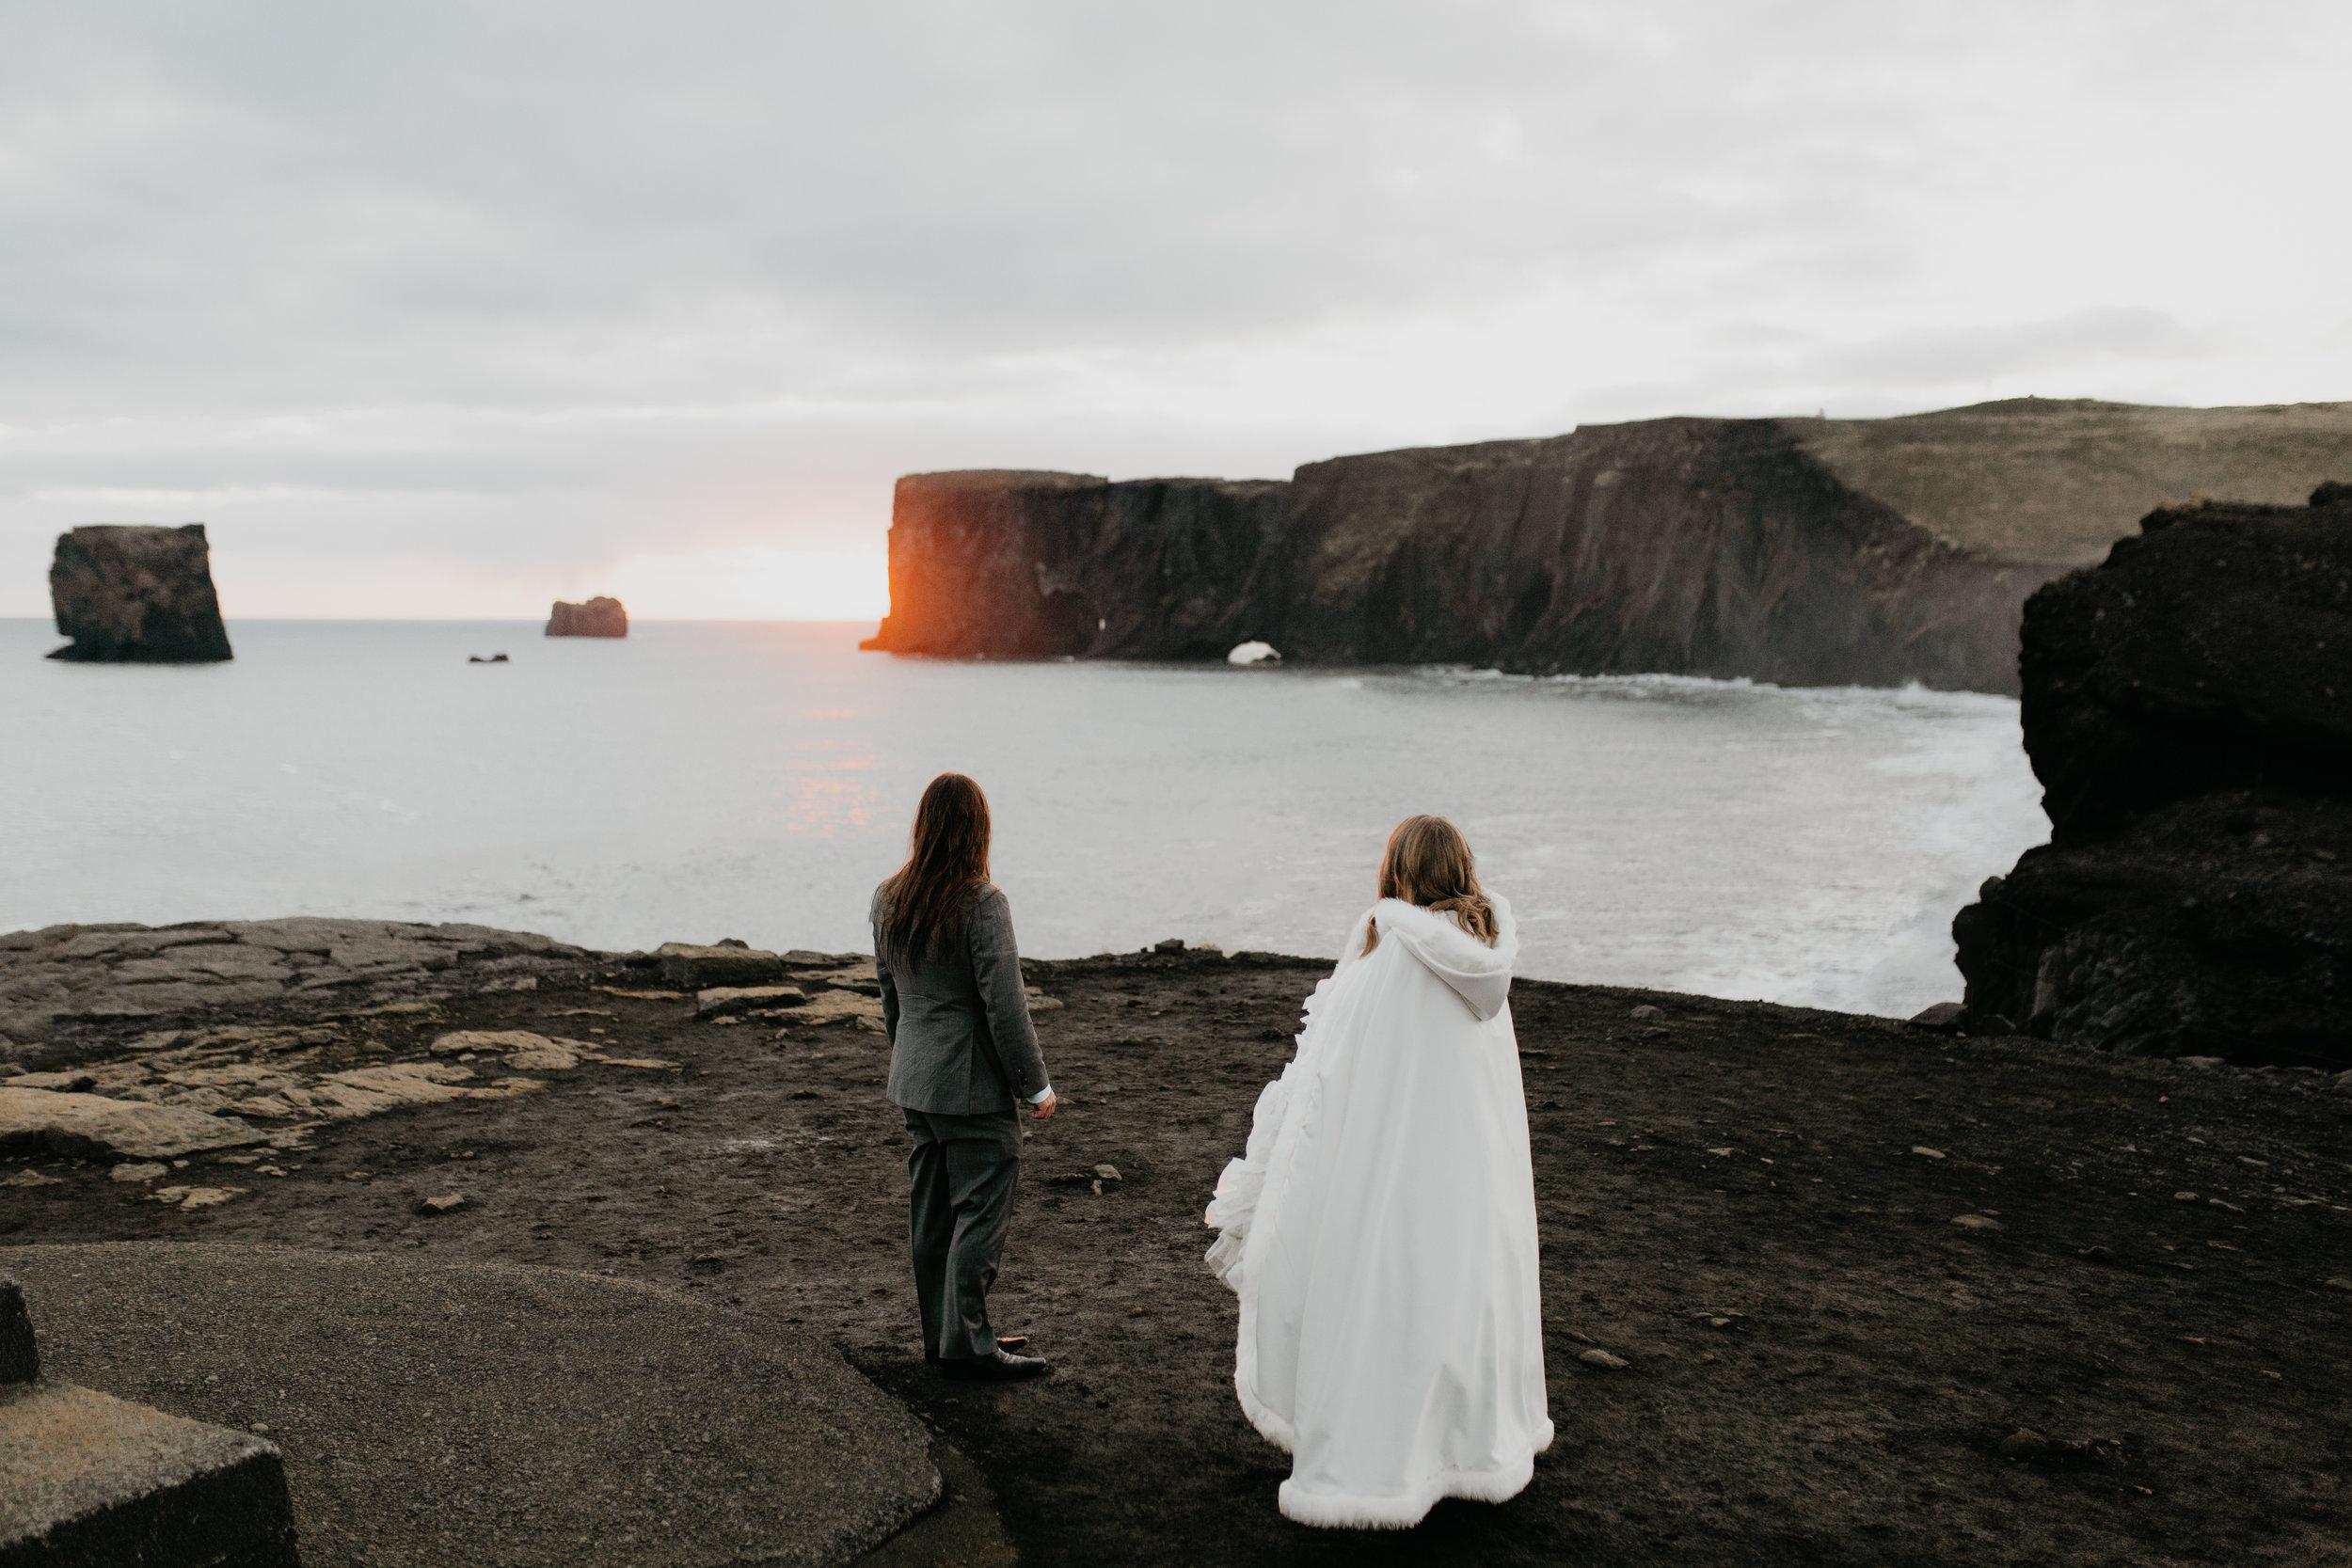 nicole-daacke-photography-iceland-winter-sunset-adventure-elopement-skogafoss-waterfall-black-sand-beach-dyrholaey-vik-iceland-intimate-wedding-black-church-elopement-photographer-54.jpg